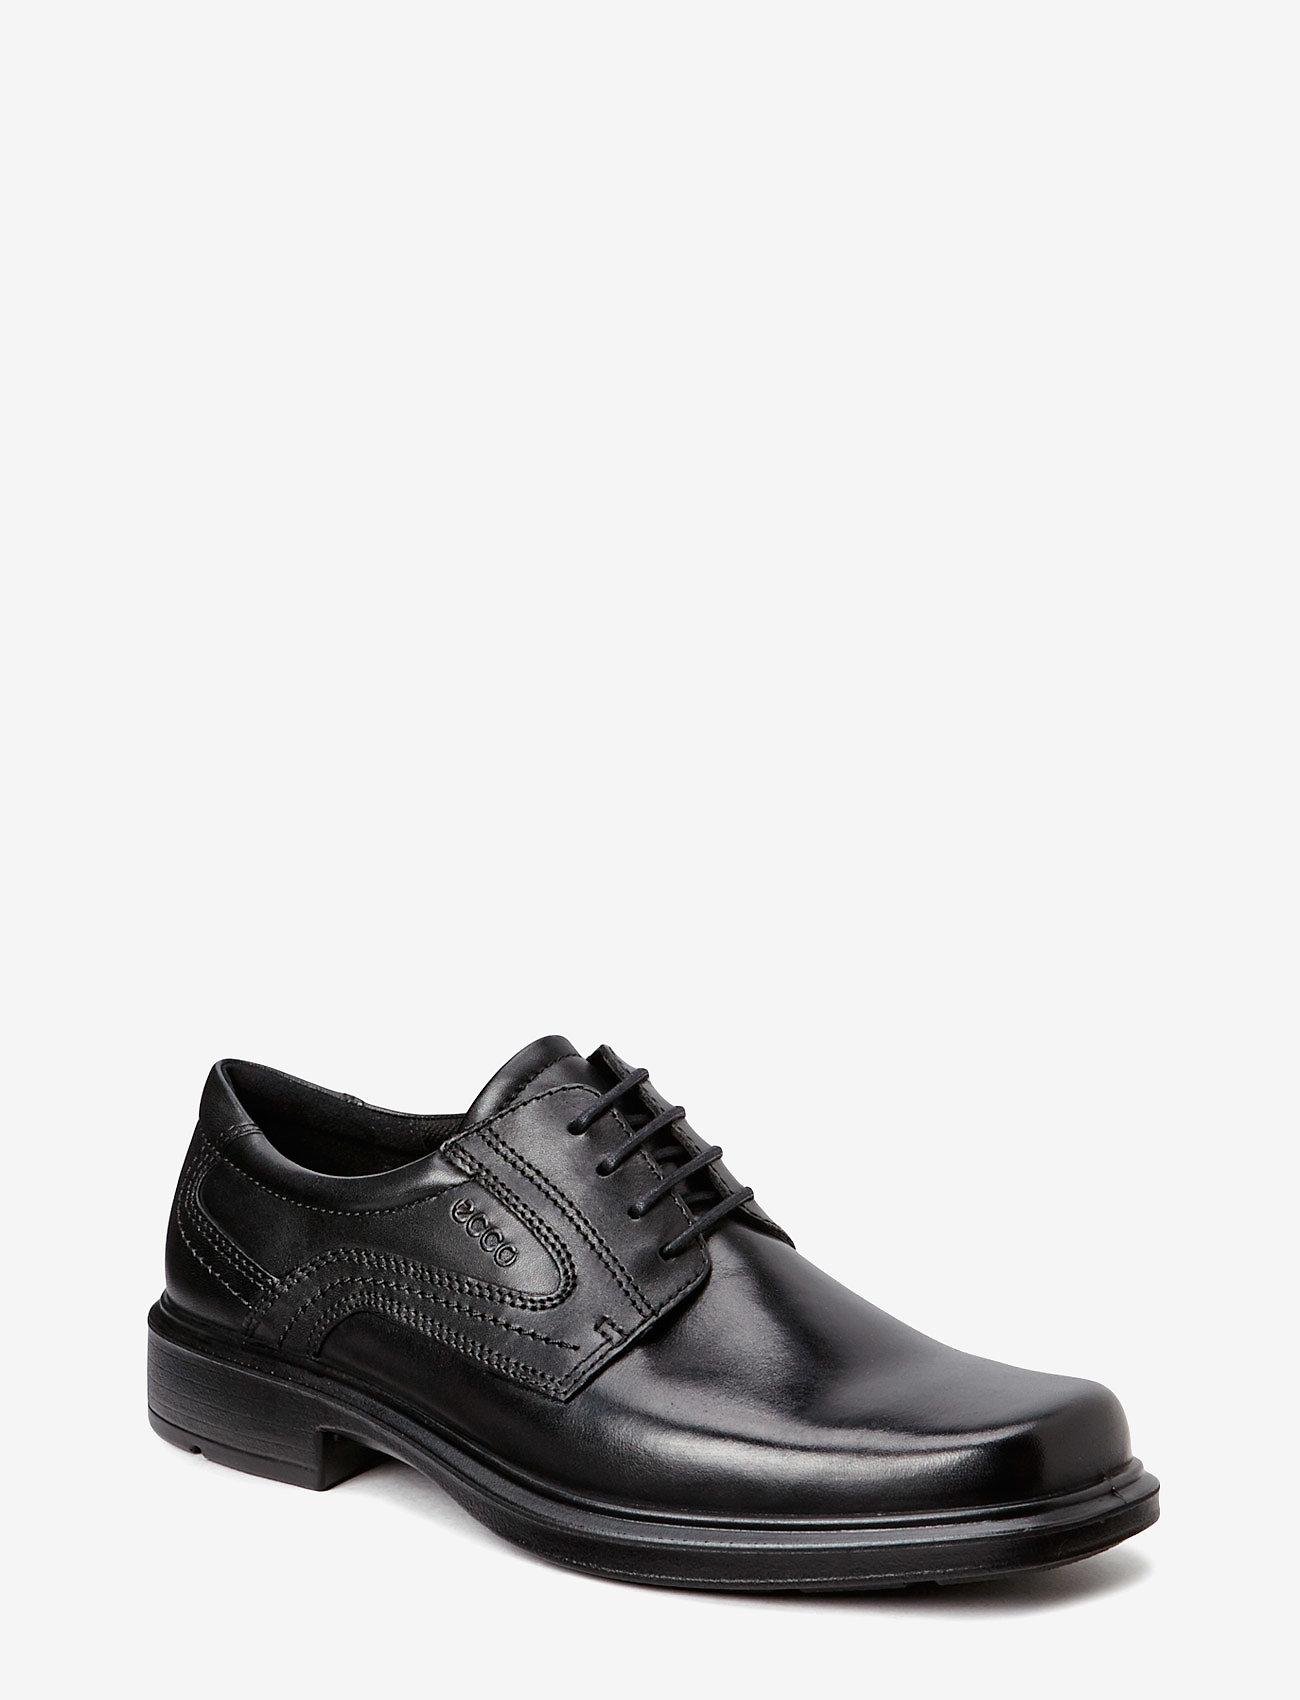 ECCO - HELSINKI - laced shoes - black - 0